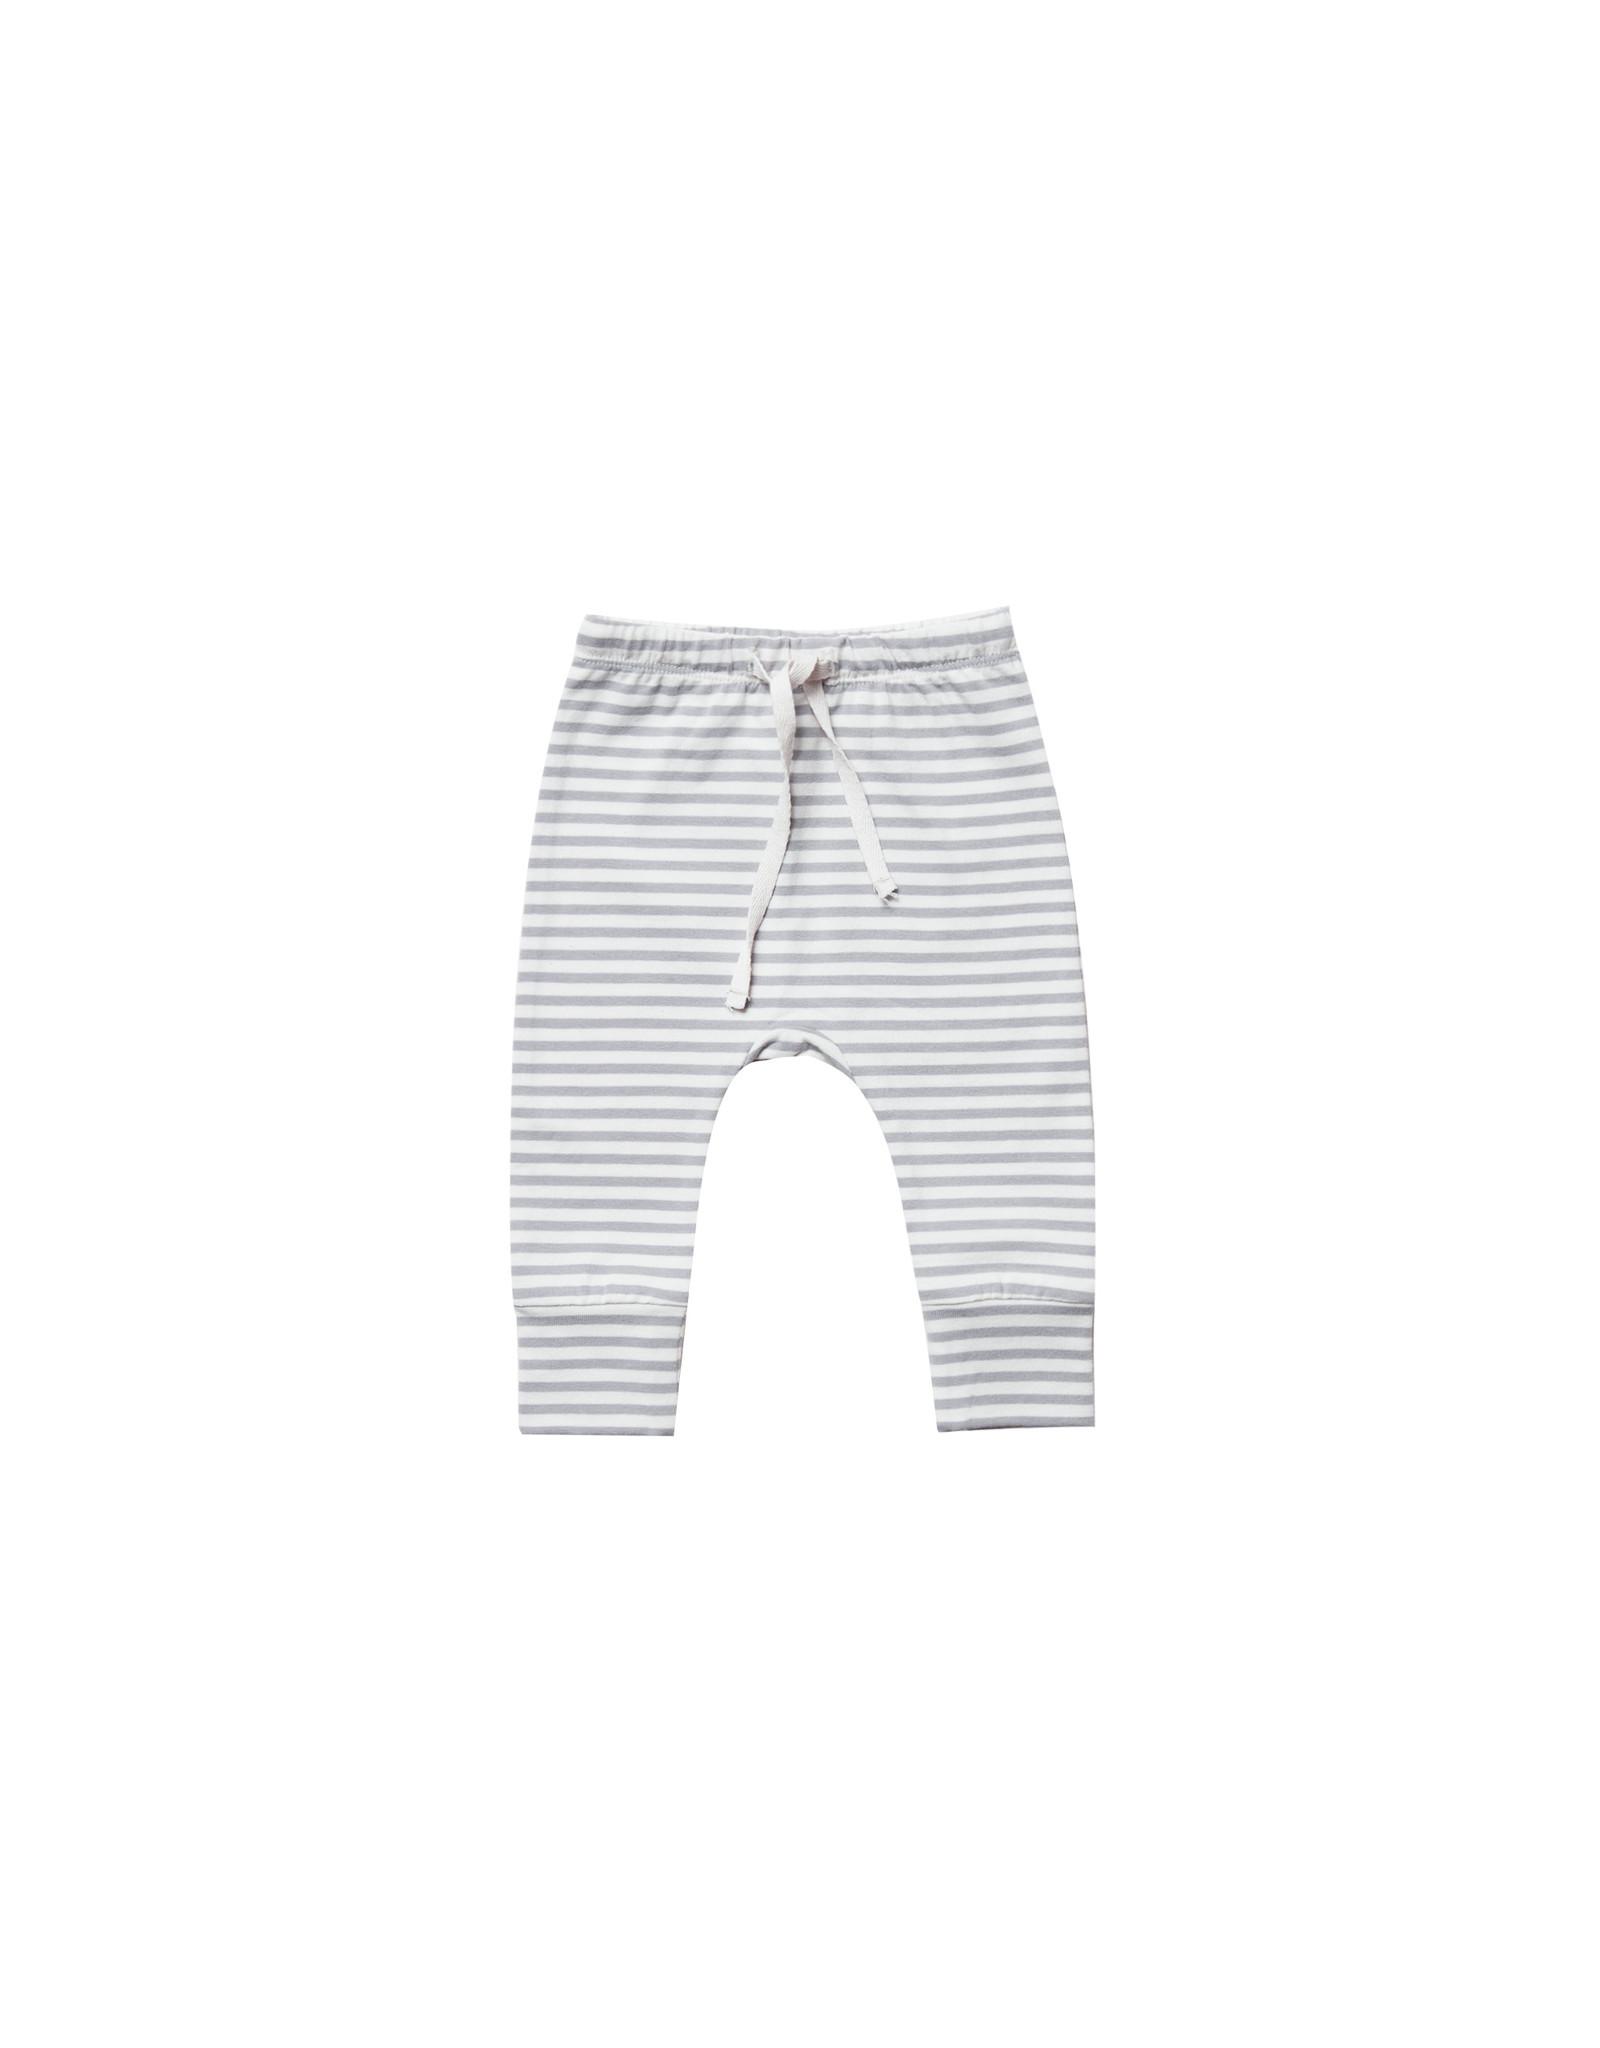 Quincy Mae Striped Drawstring Pant